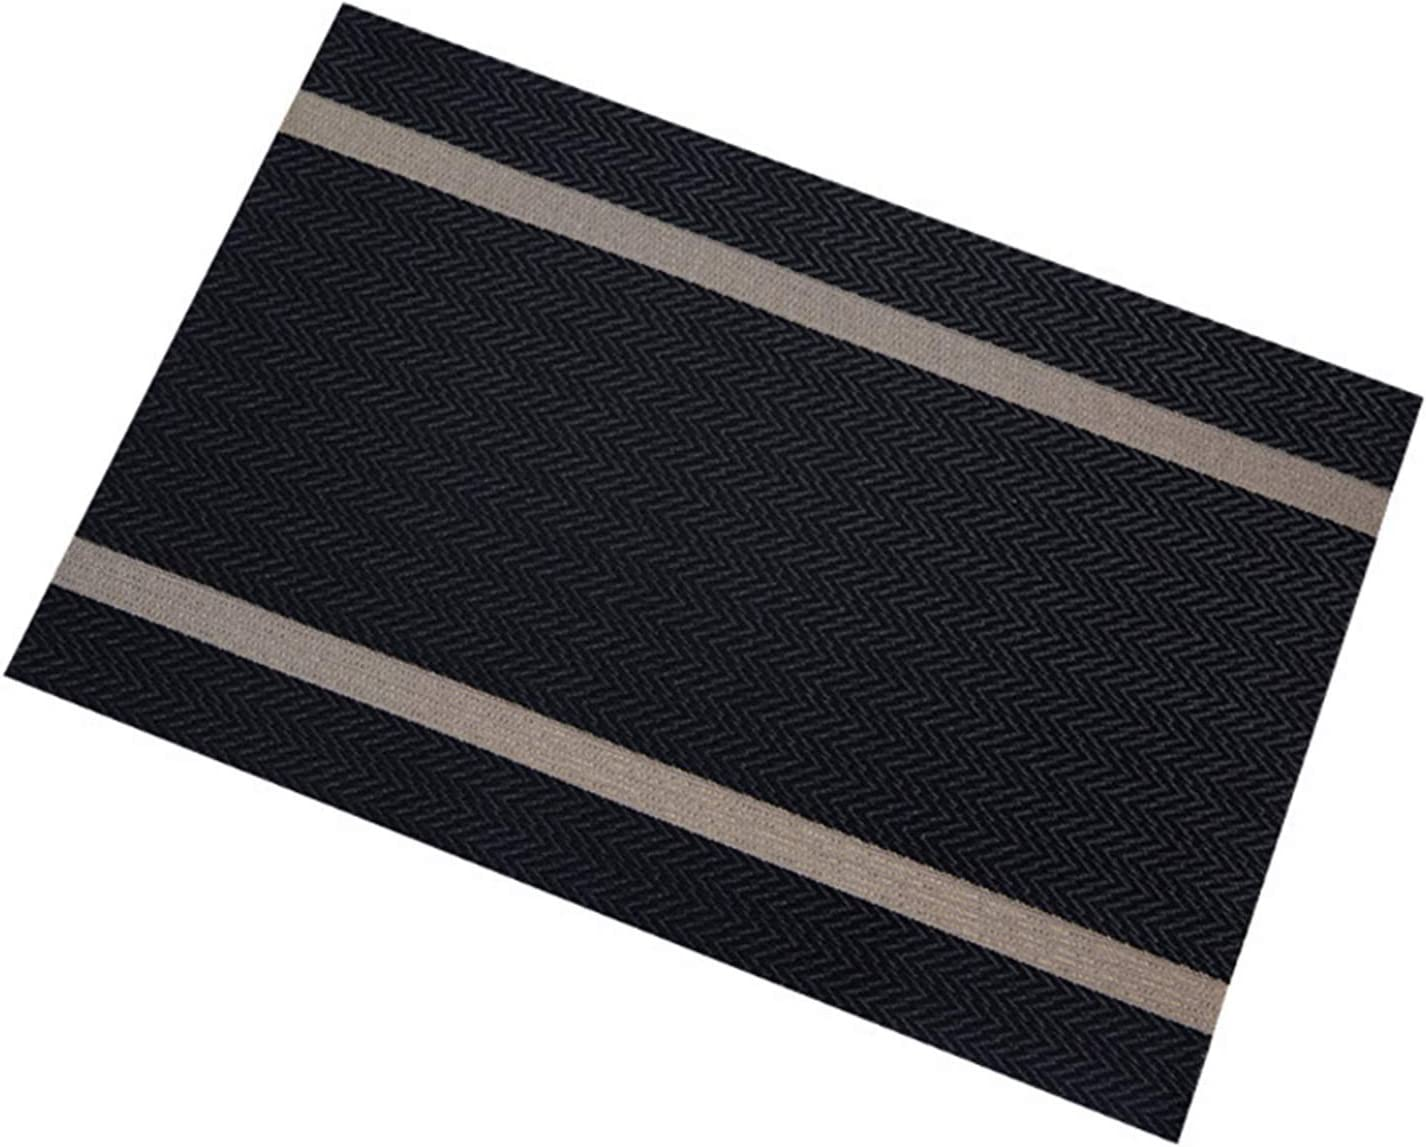 XIZHOUCUN Tableware Pad Placemat Table Mat Insulation Heat N Bargain sale Dallas Mall PVC